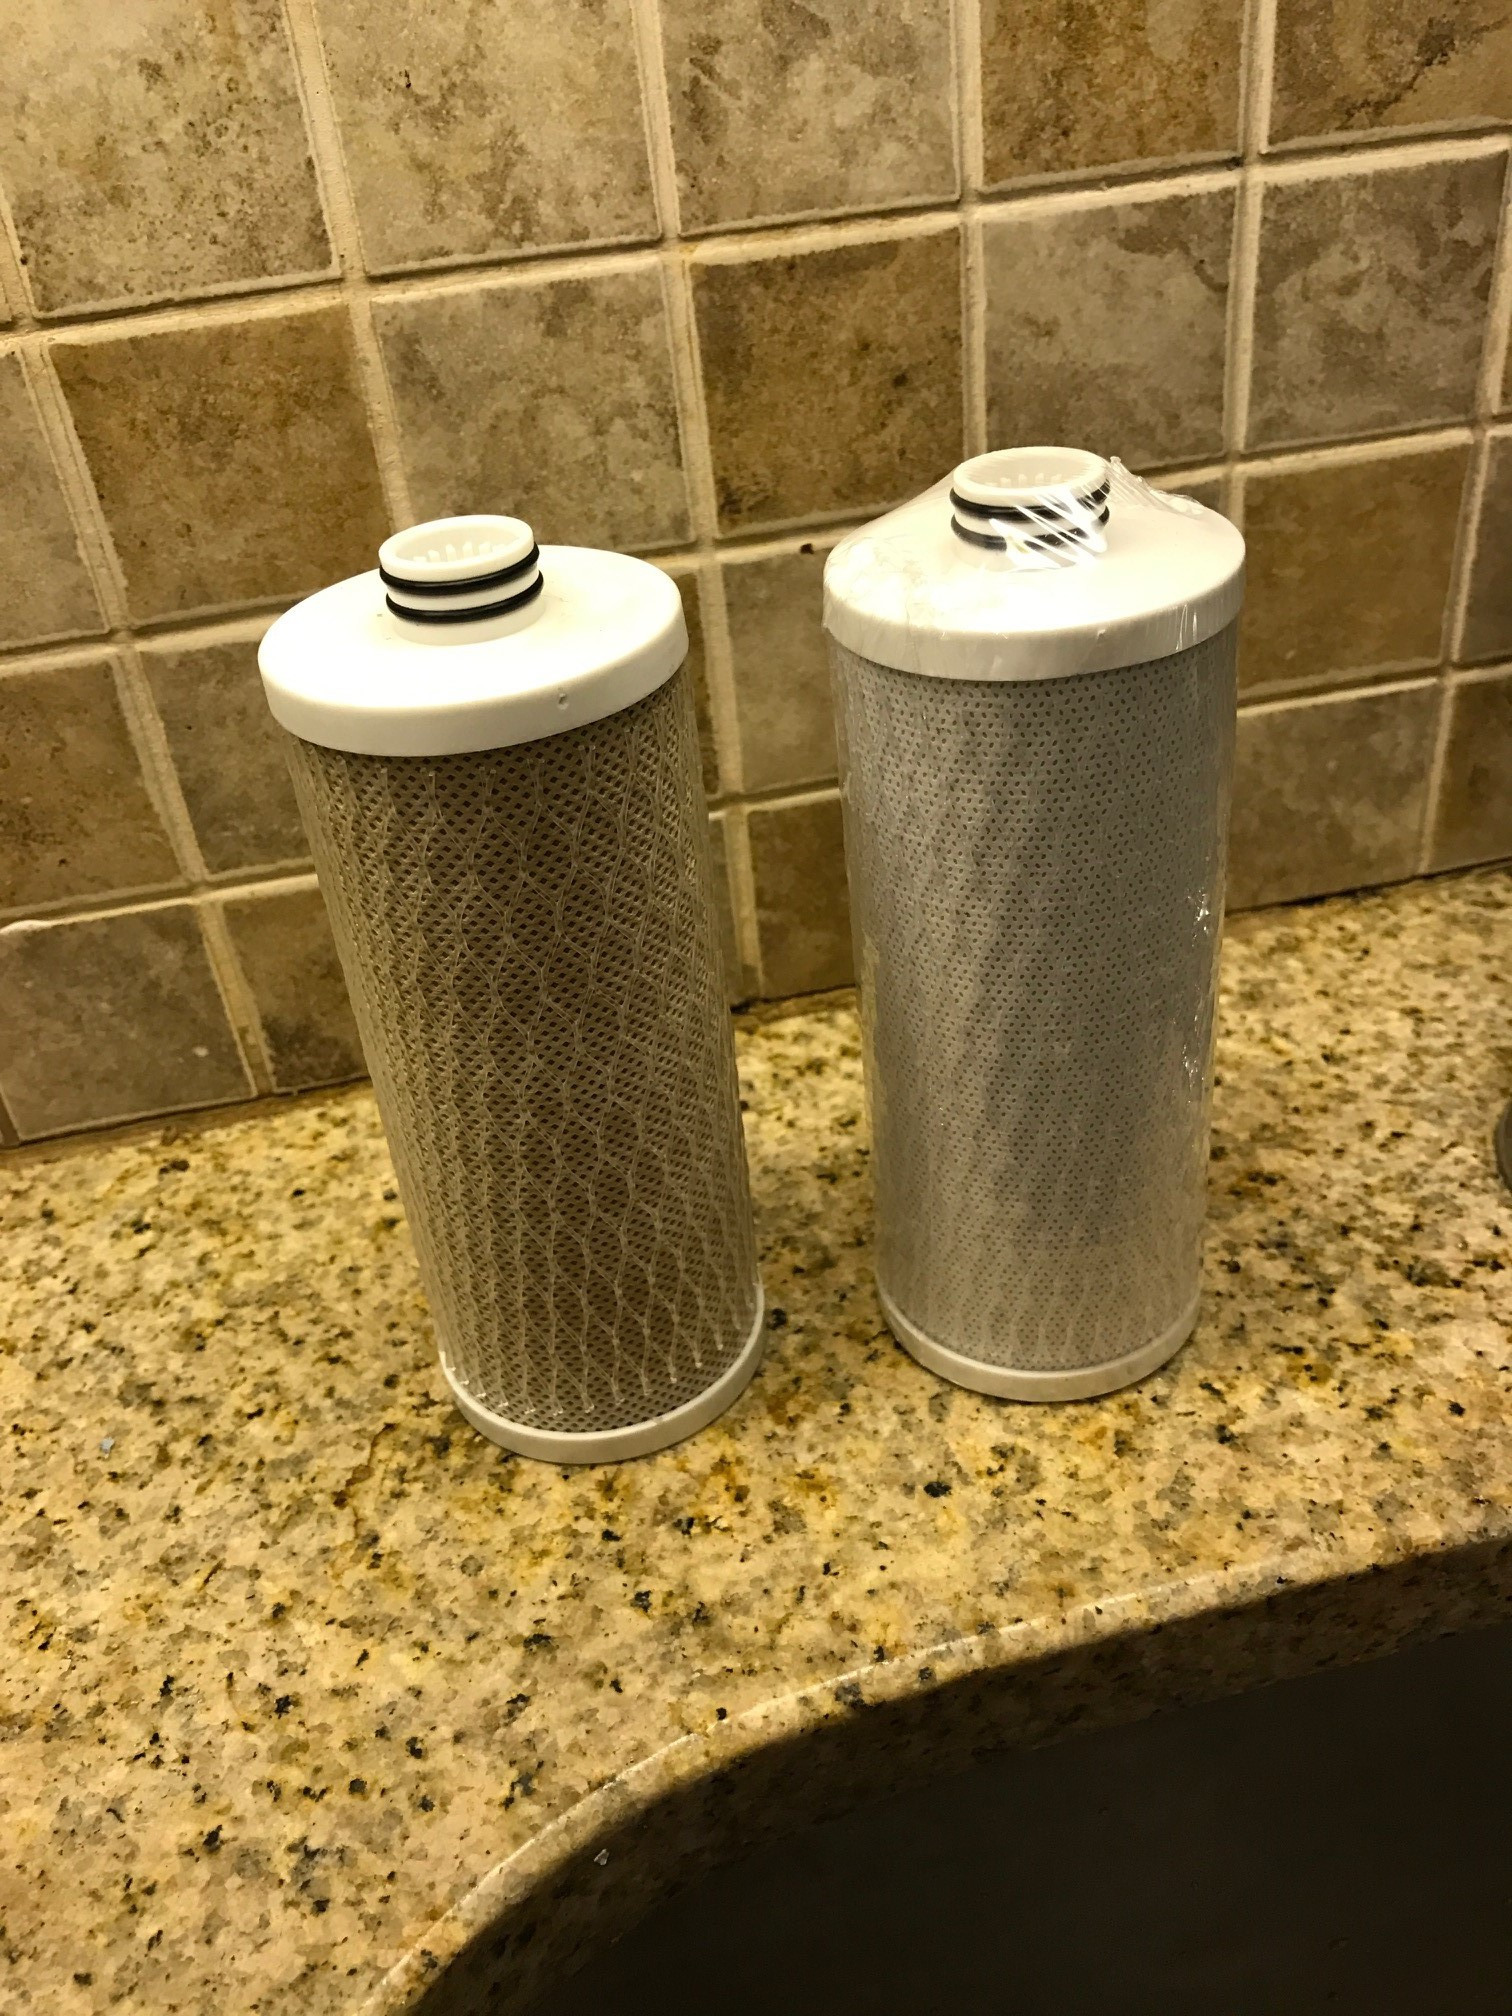 aquasana filter before and after